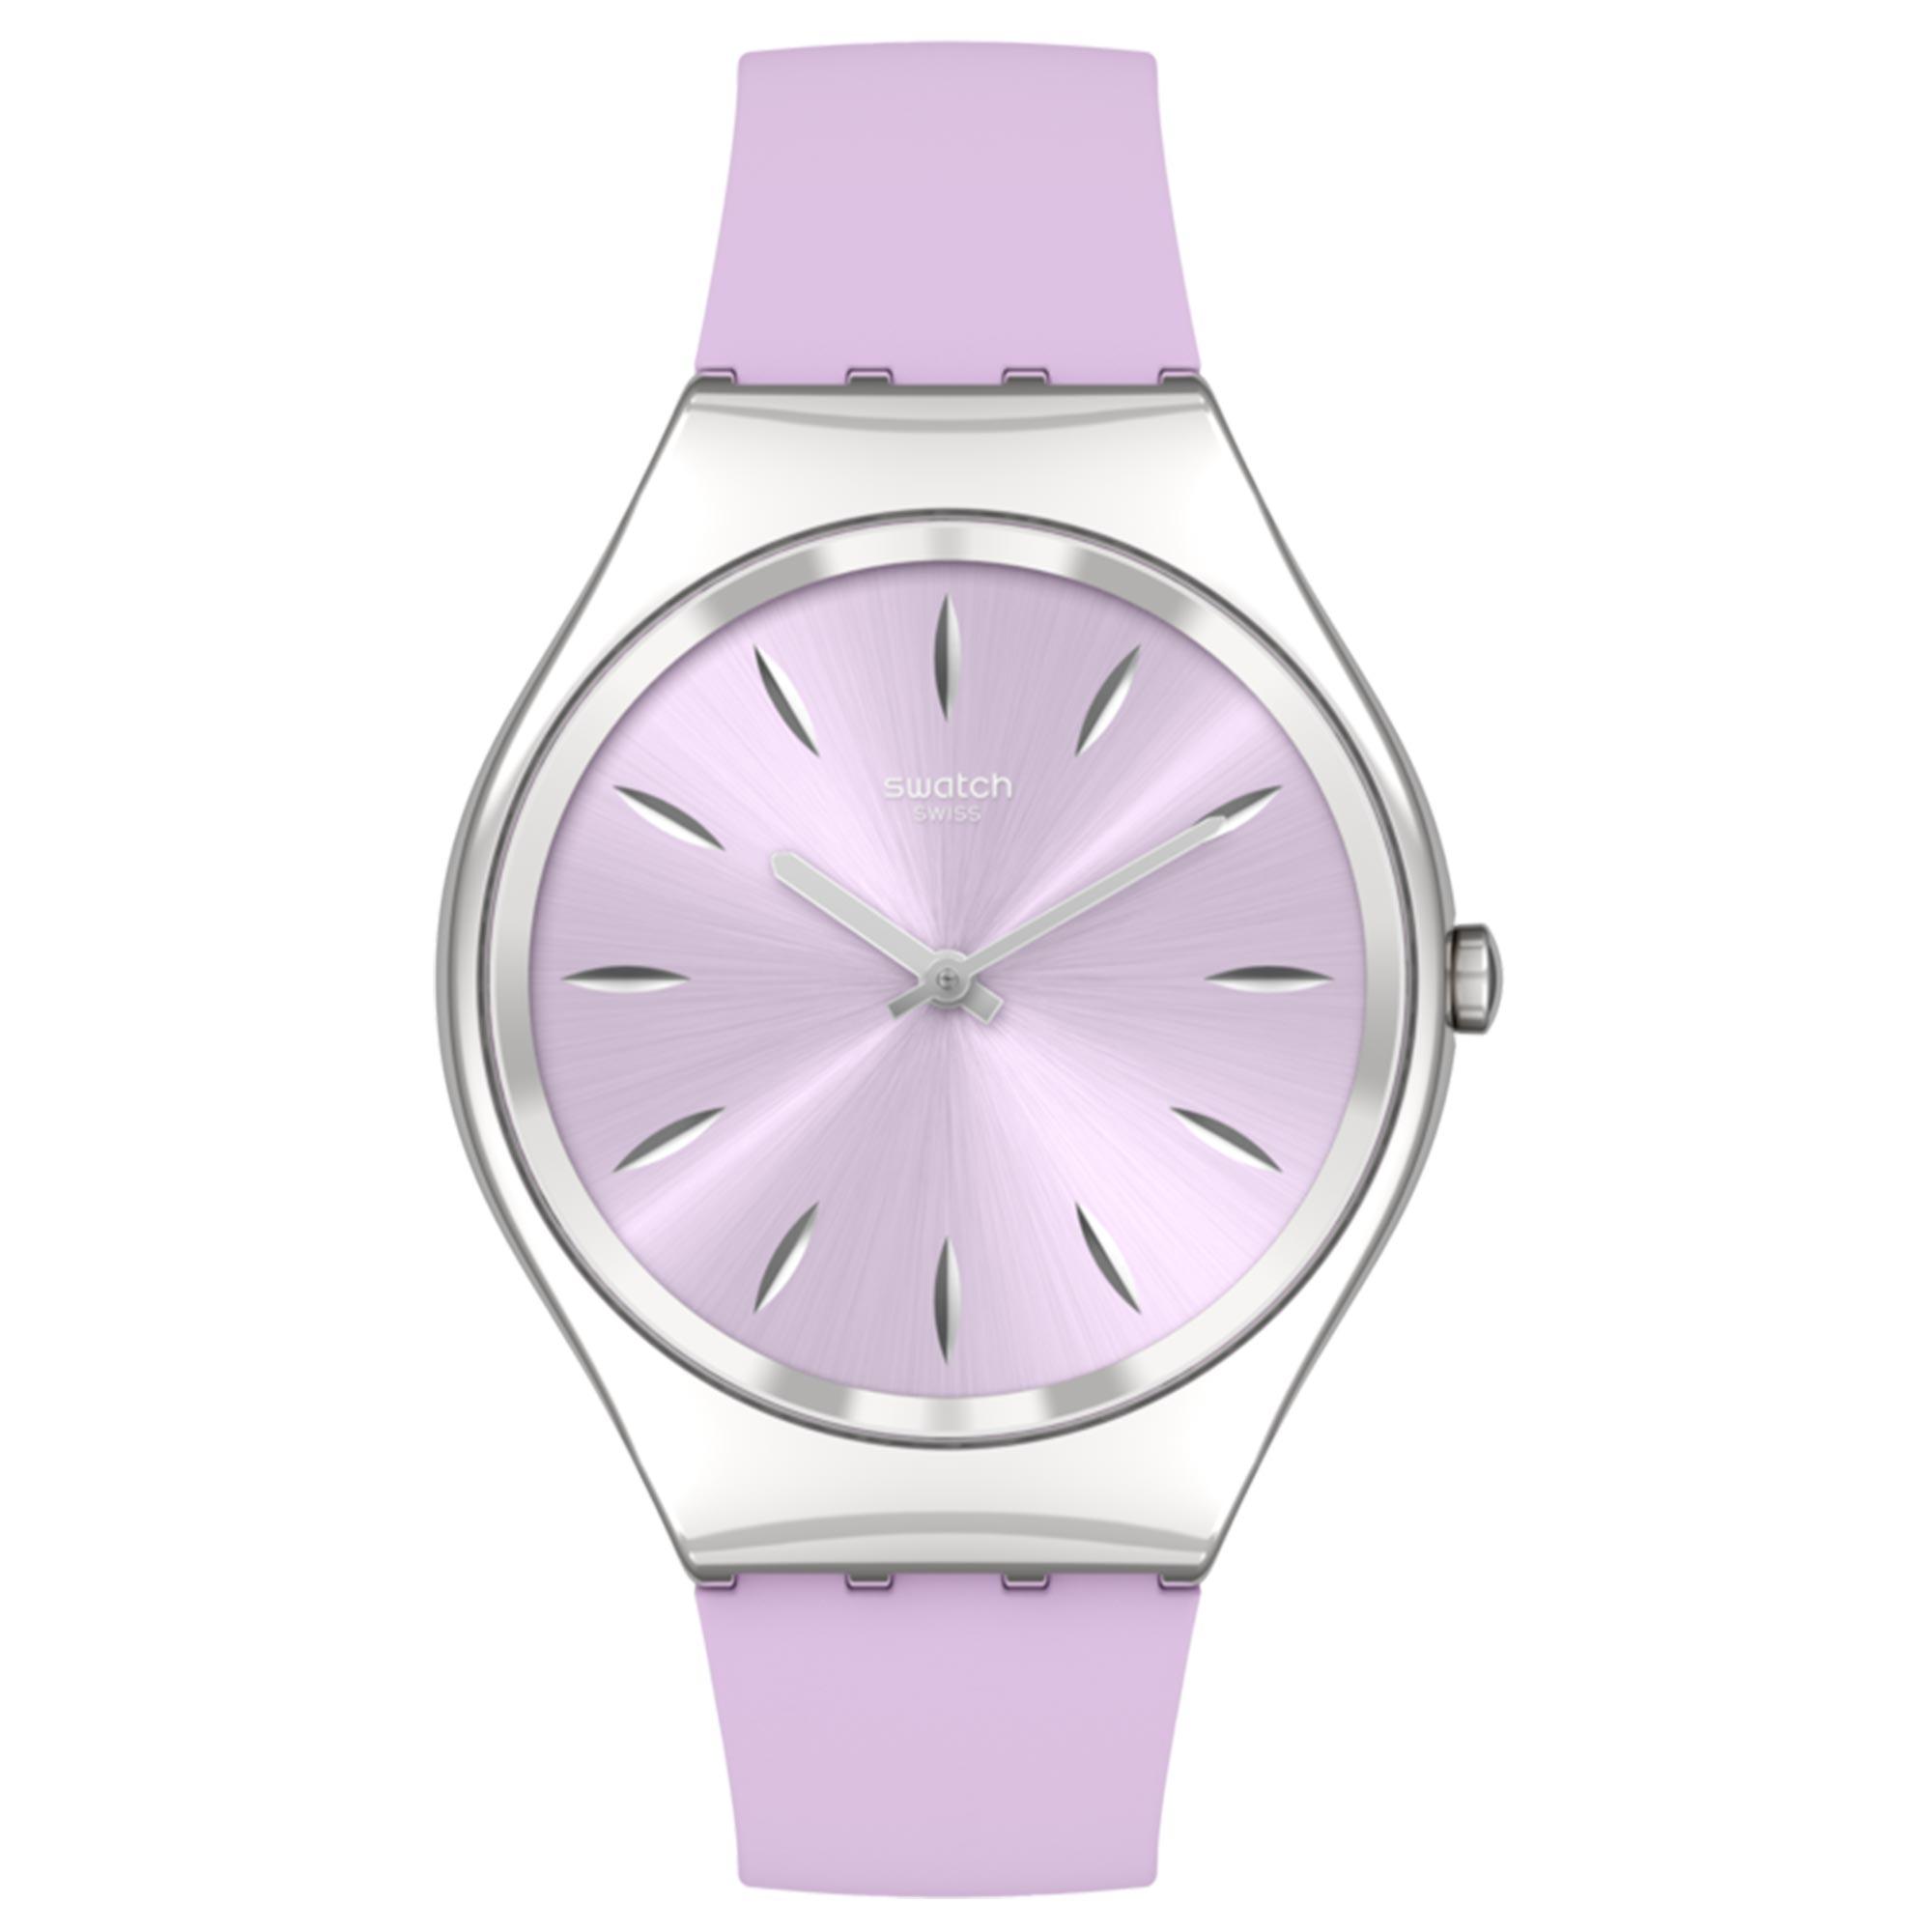 Swatch SKINSOFTBLINK Quartz Movement Pink Dial Silicone Bracelet Ladies Watch SYXS131